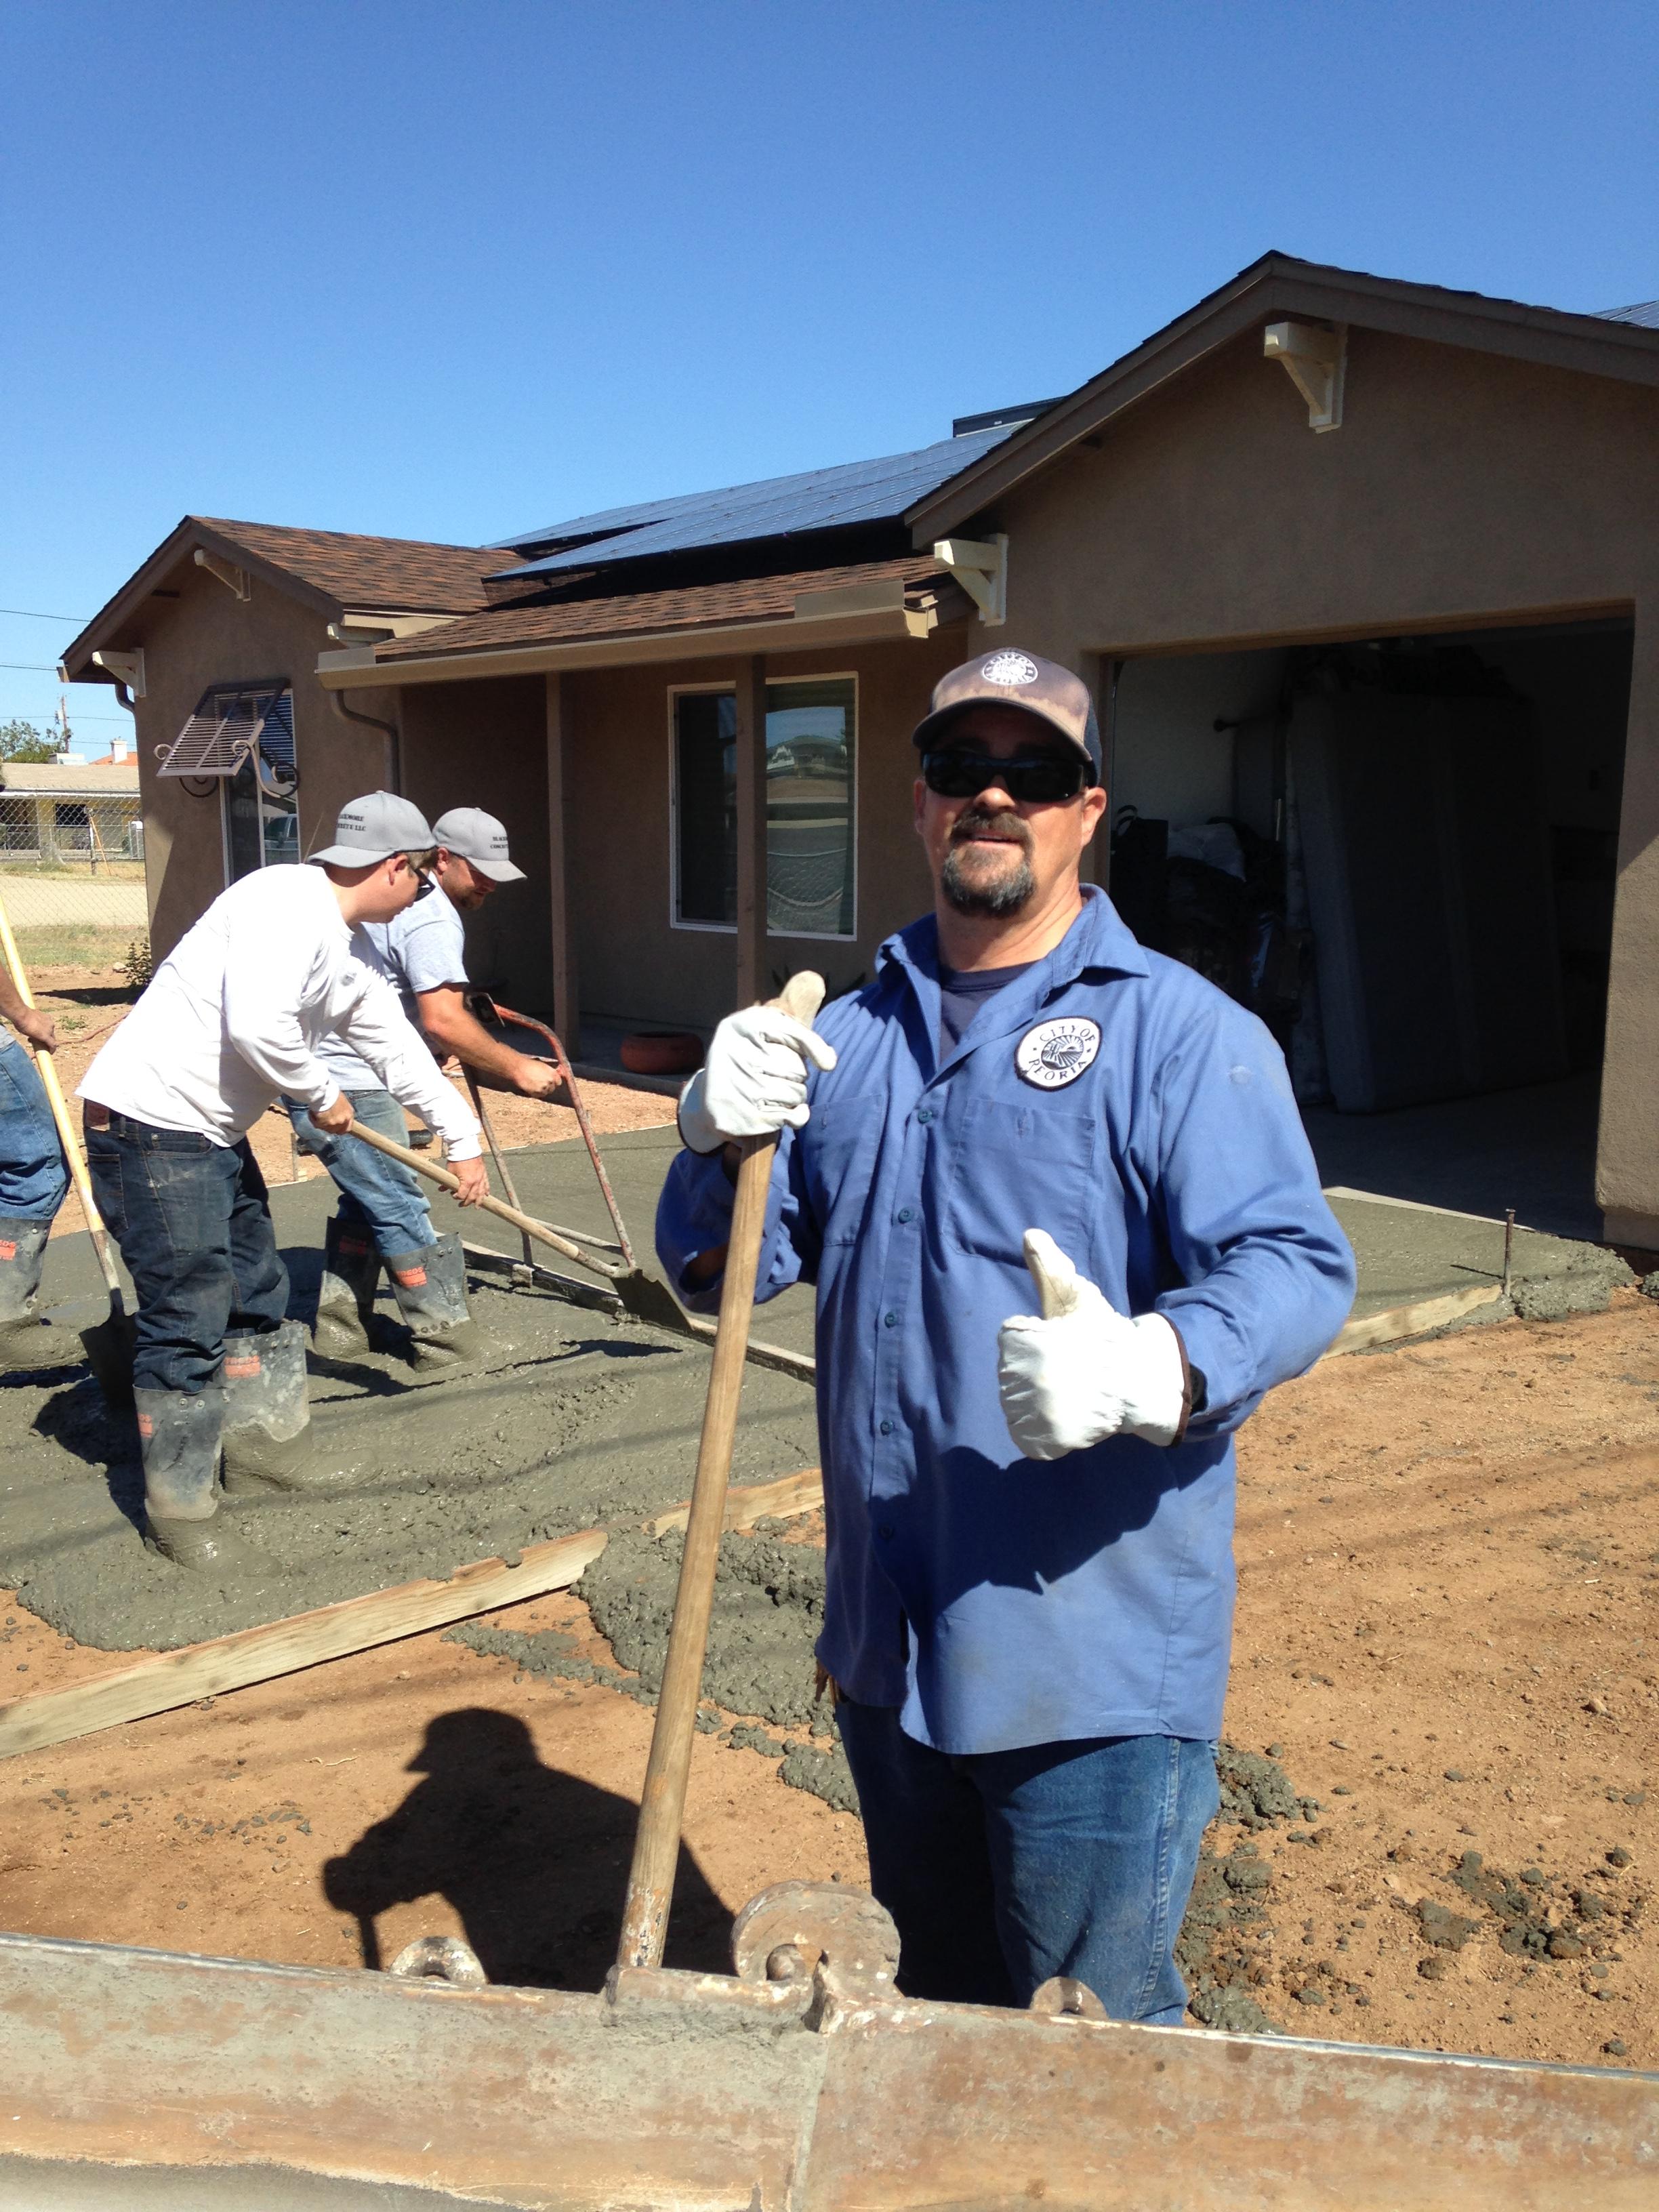 05.09.15_12 Concrete pour_Tom Davis and volunteers.jpg